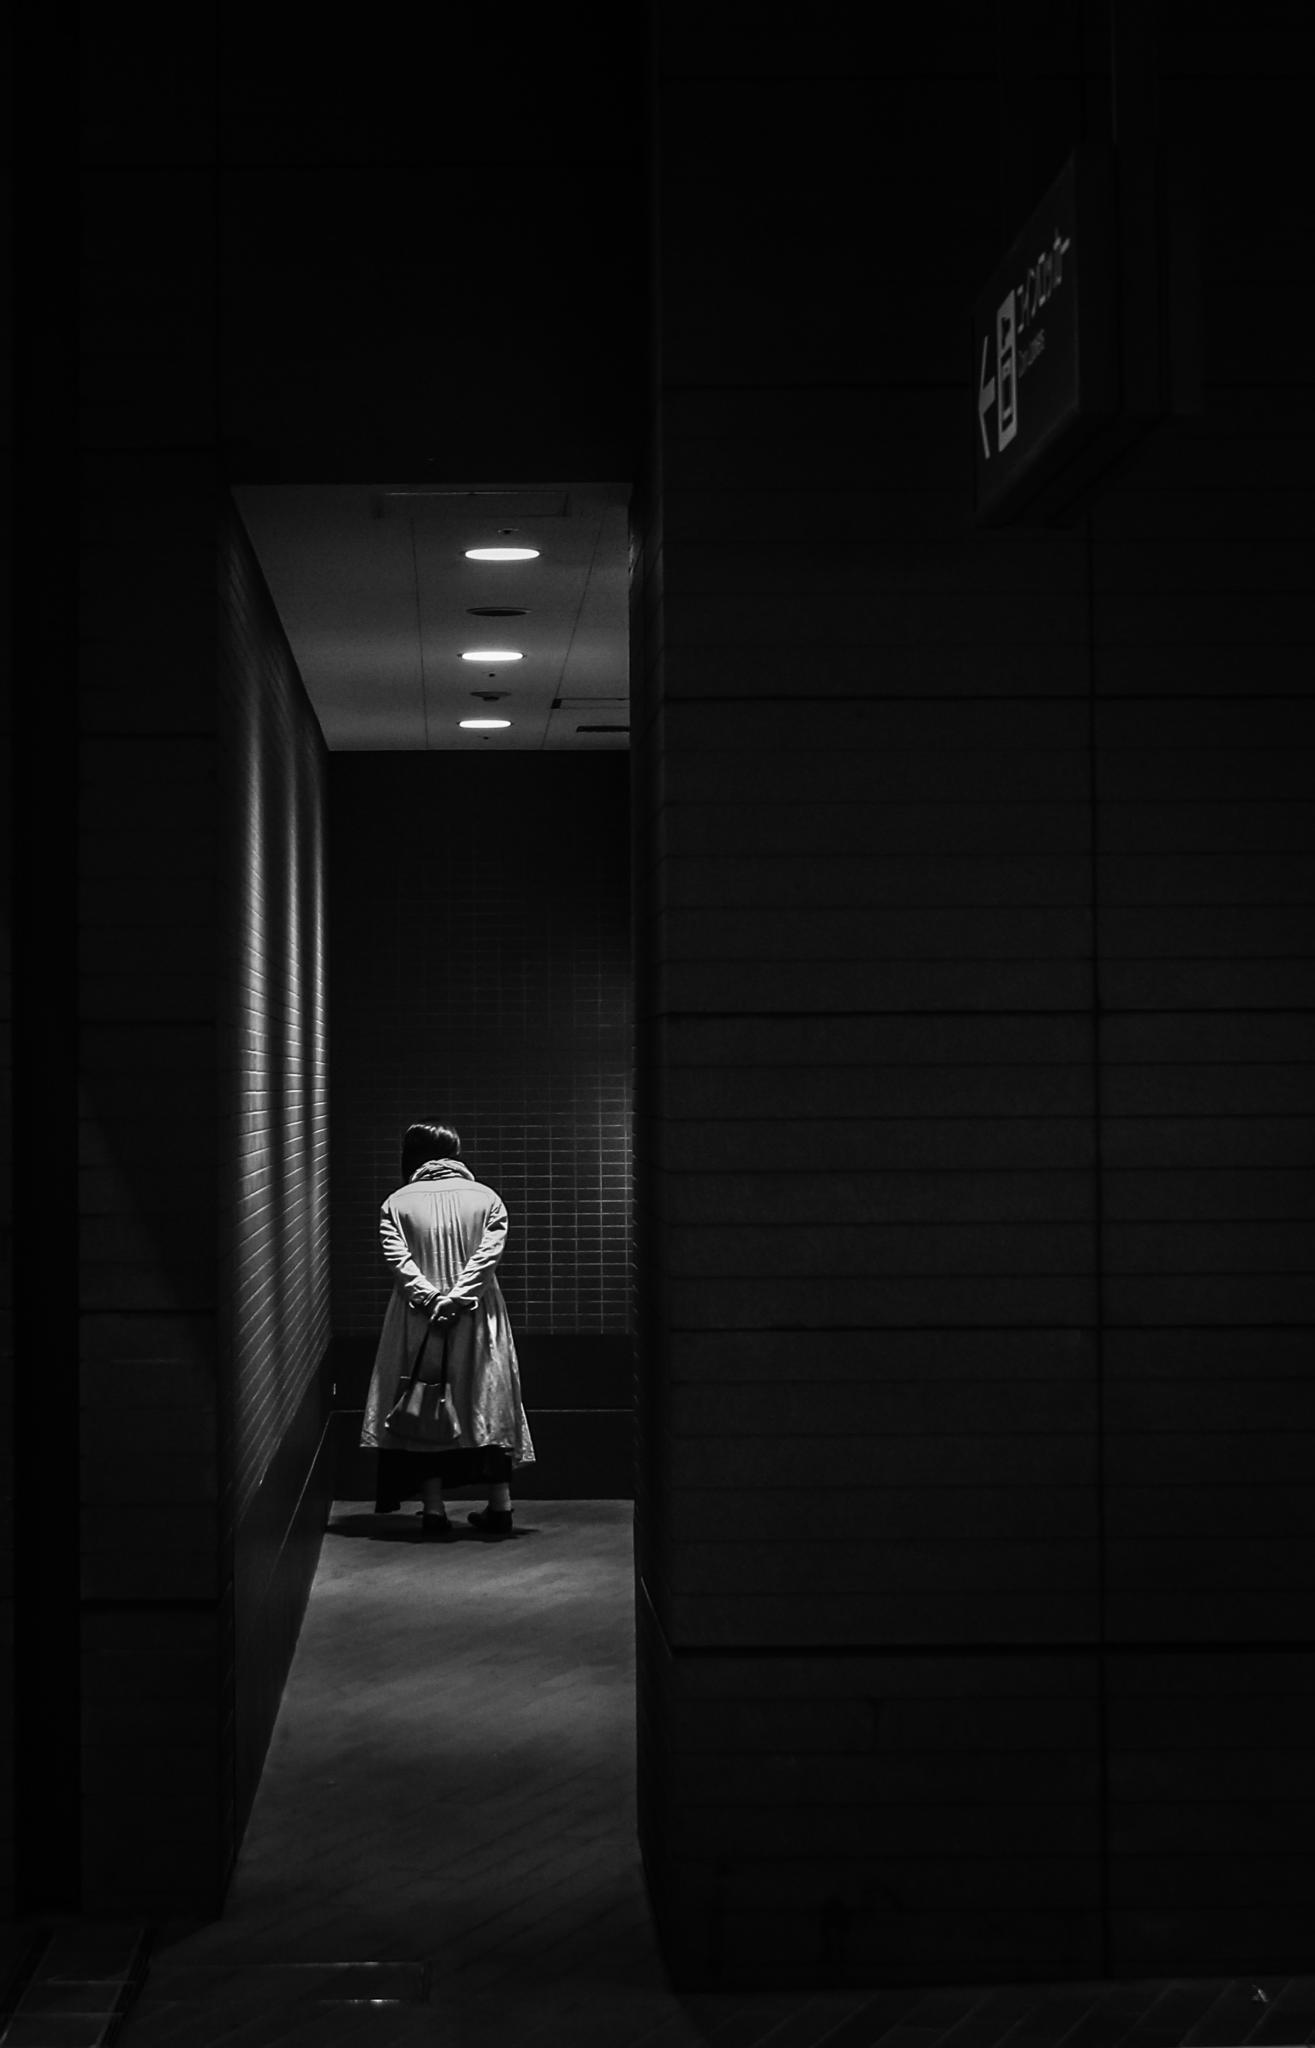 hide by Jp Punzalan